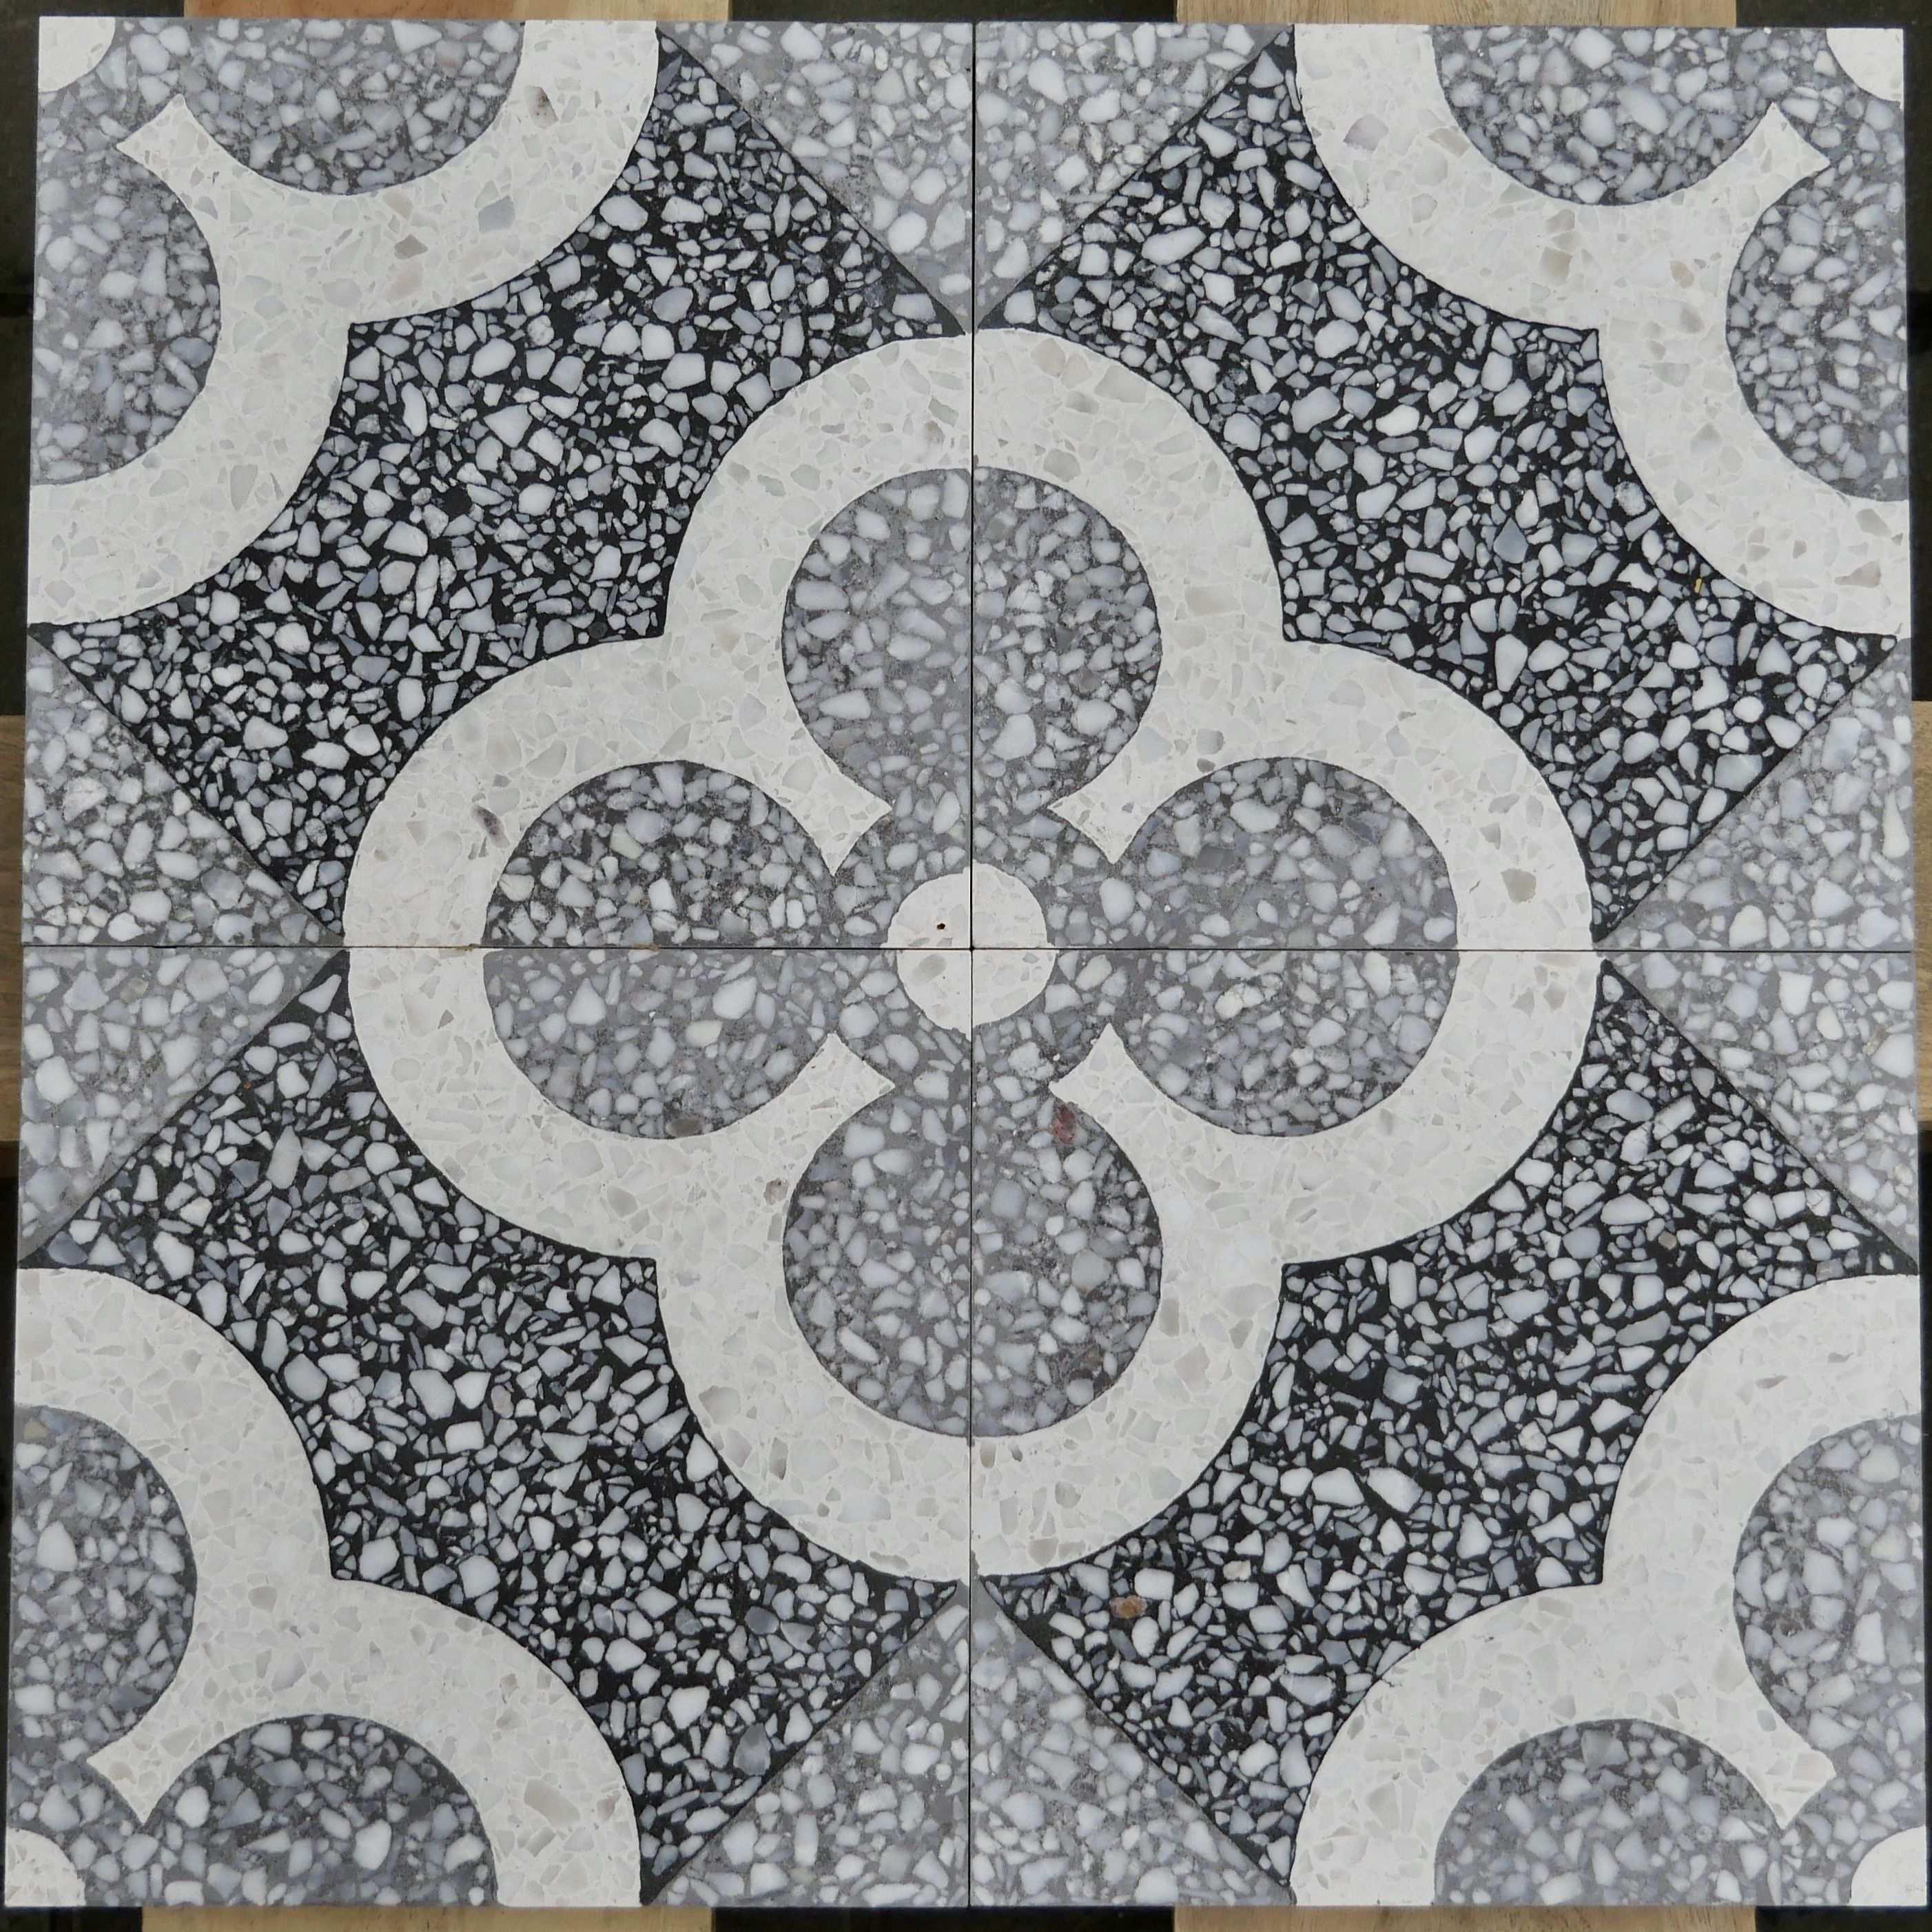 Via Terrazzoplatten Grob Mosaikfliesen Mosaik Fliesen